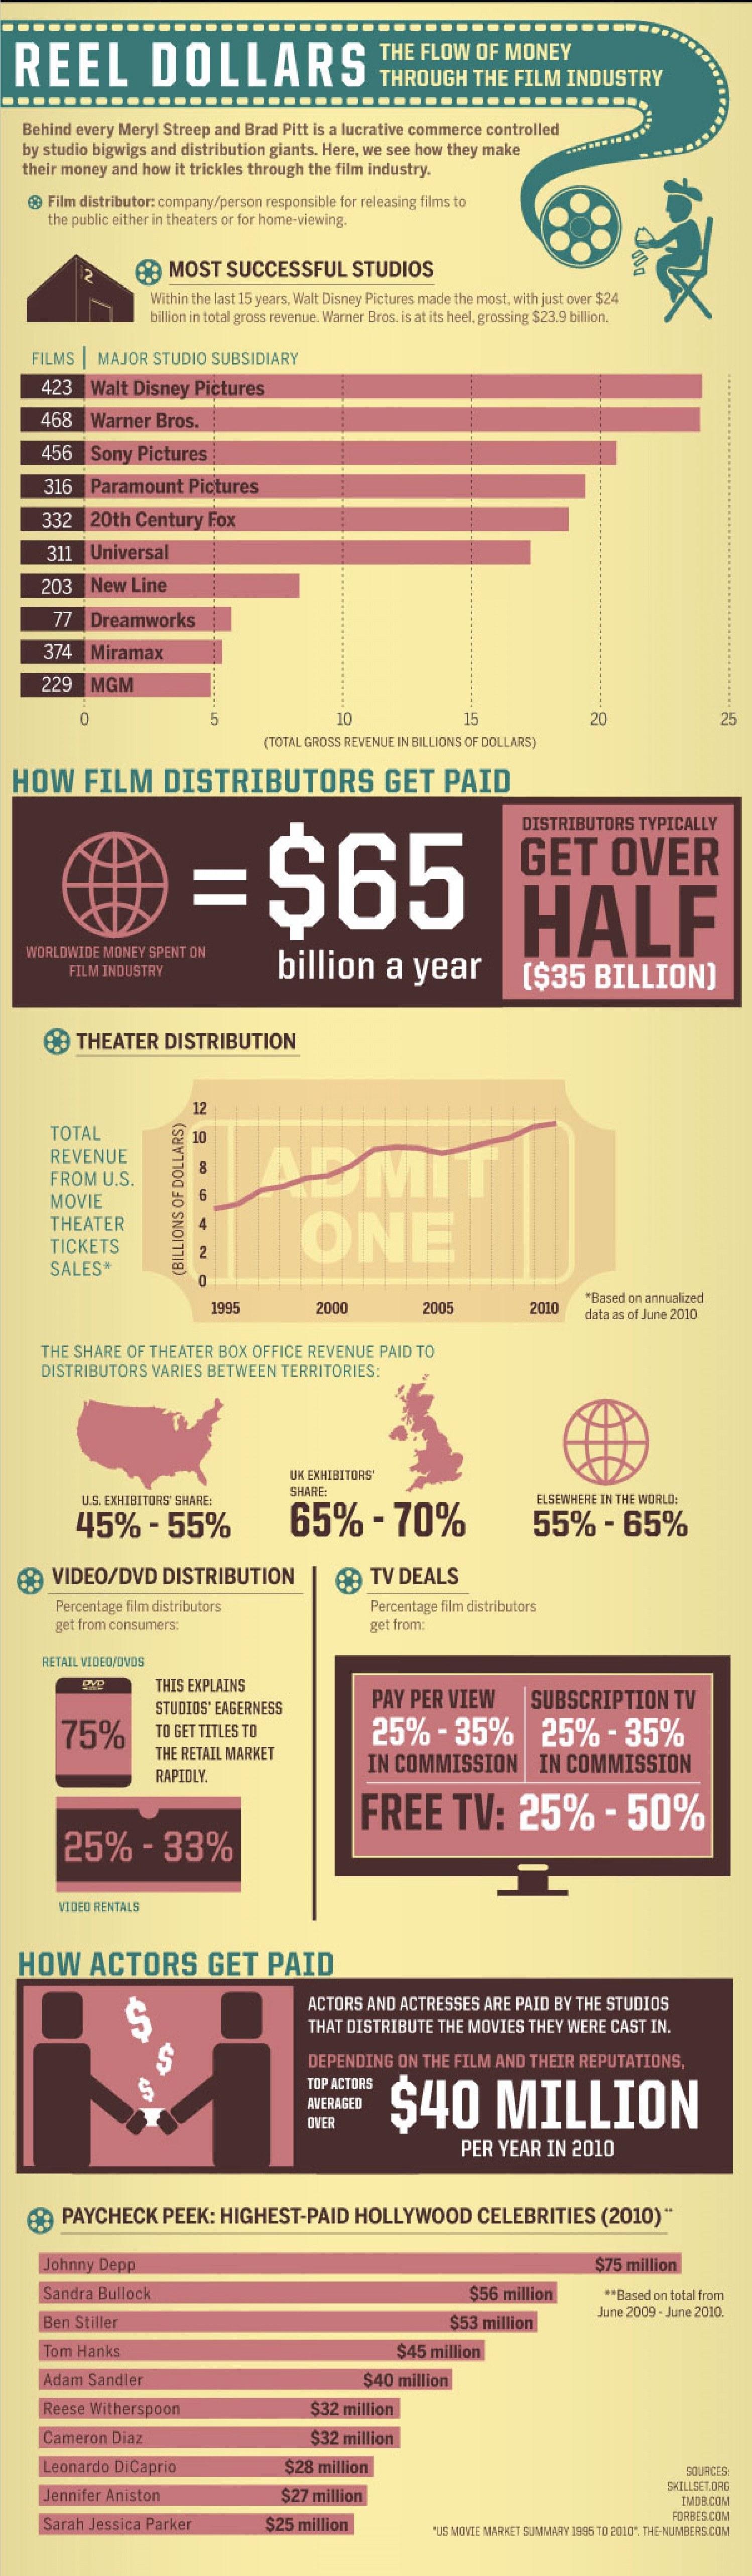 reel dollars infographic